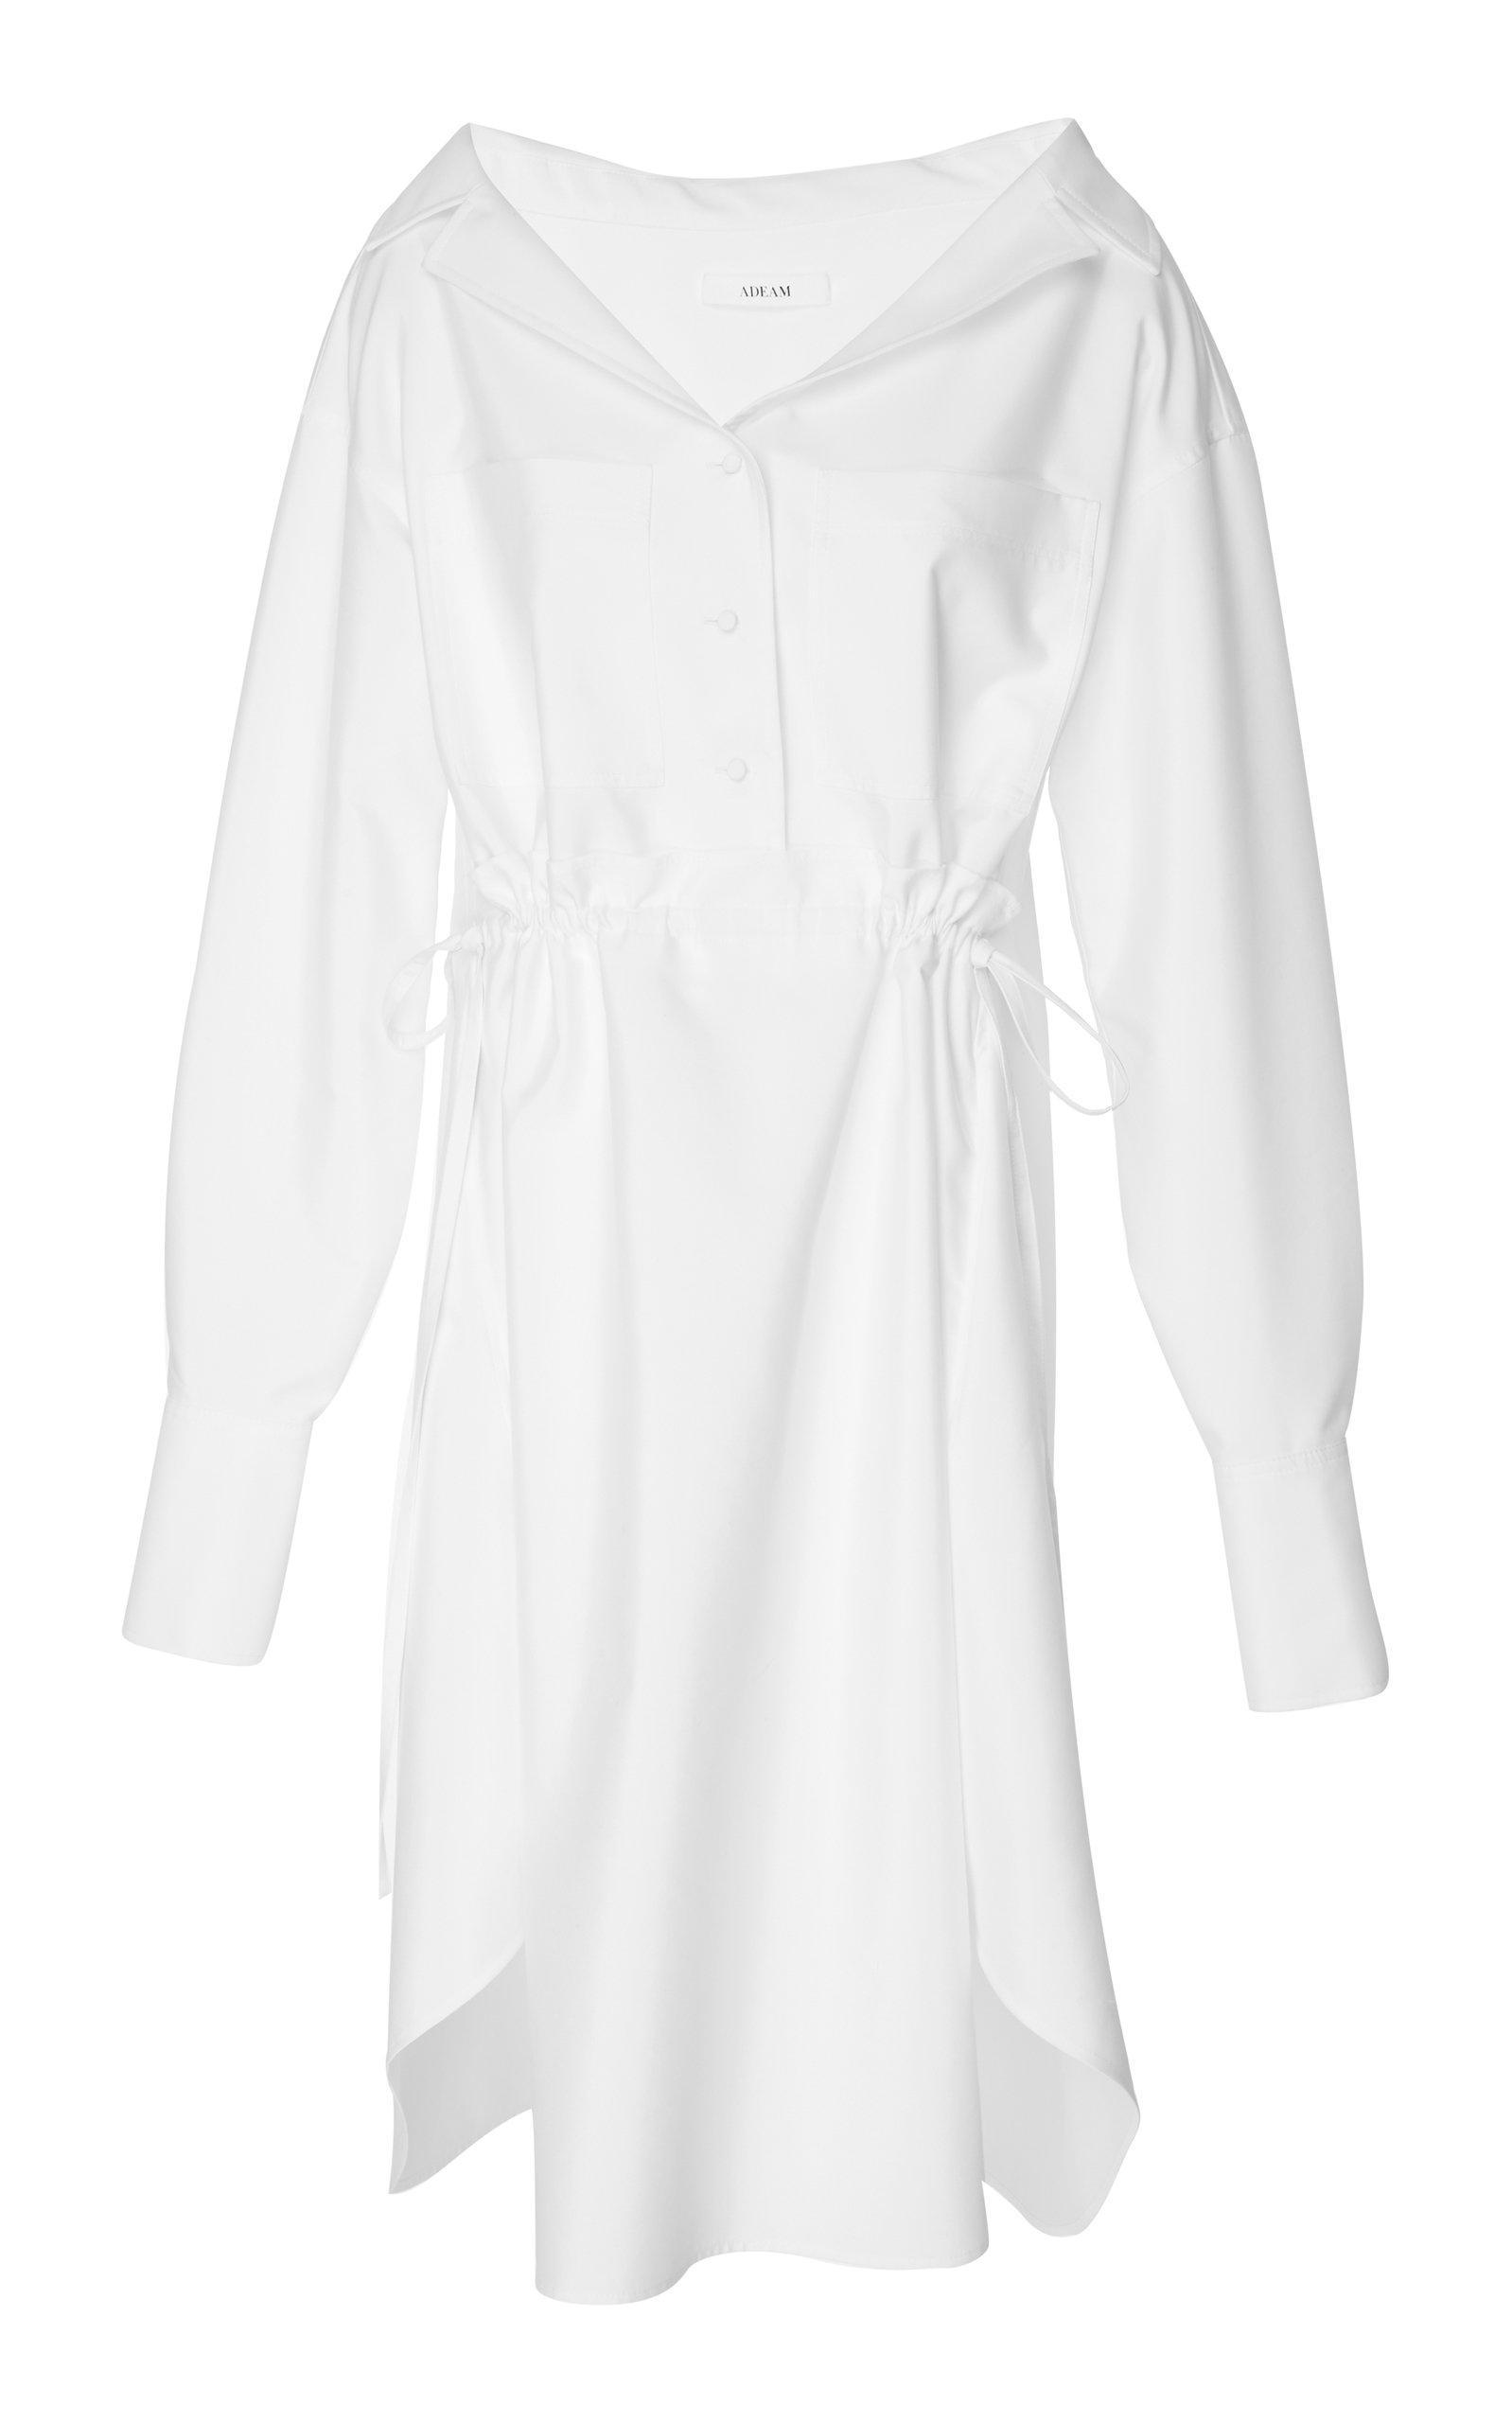 Adeam Drawstring Shirt Dress In White